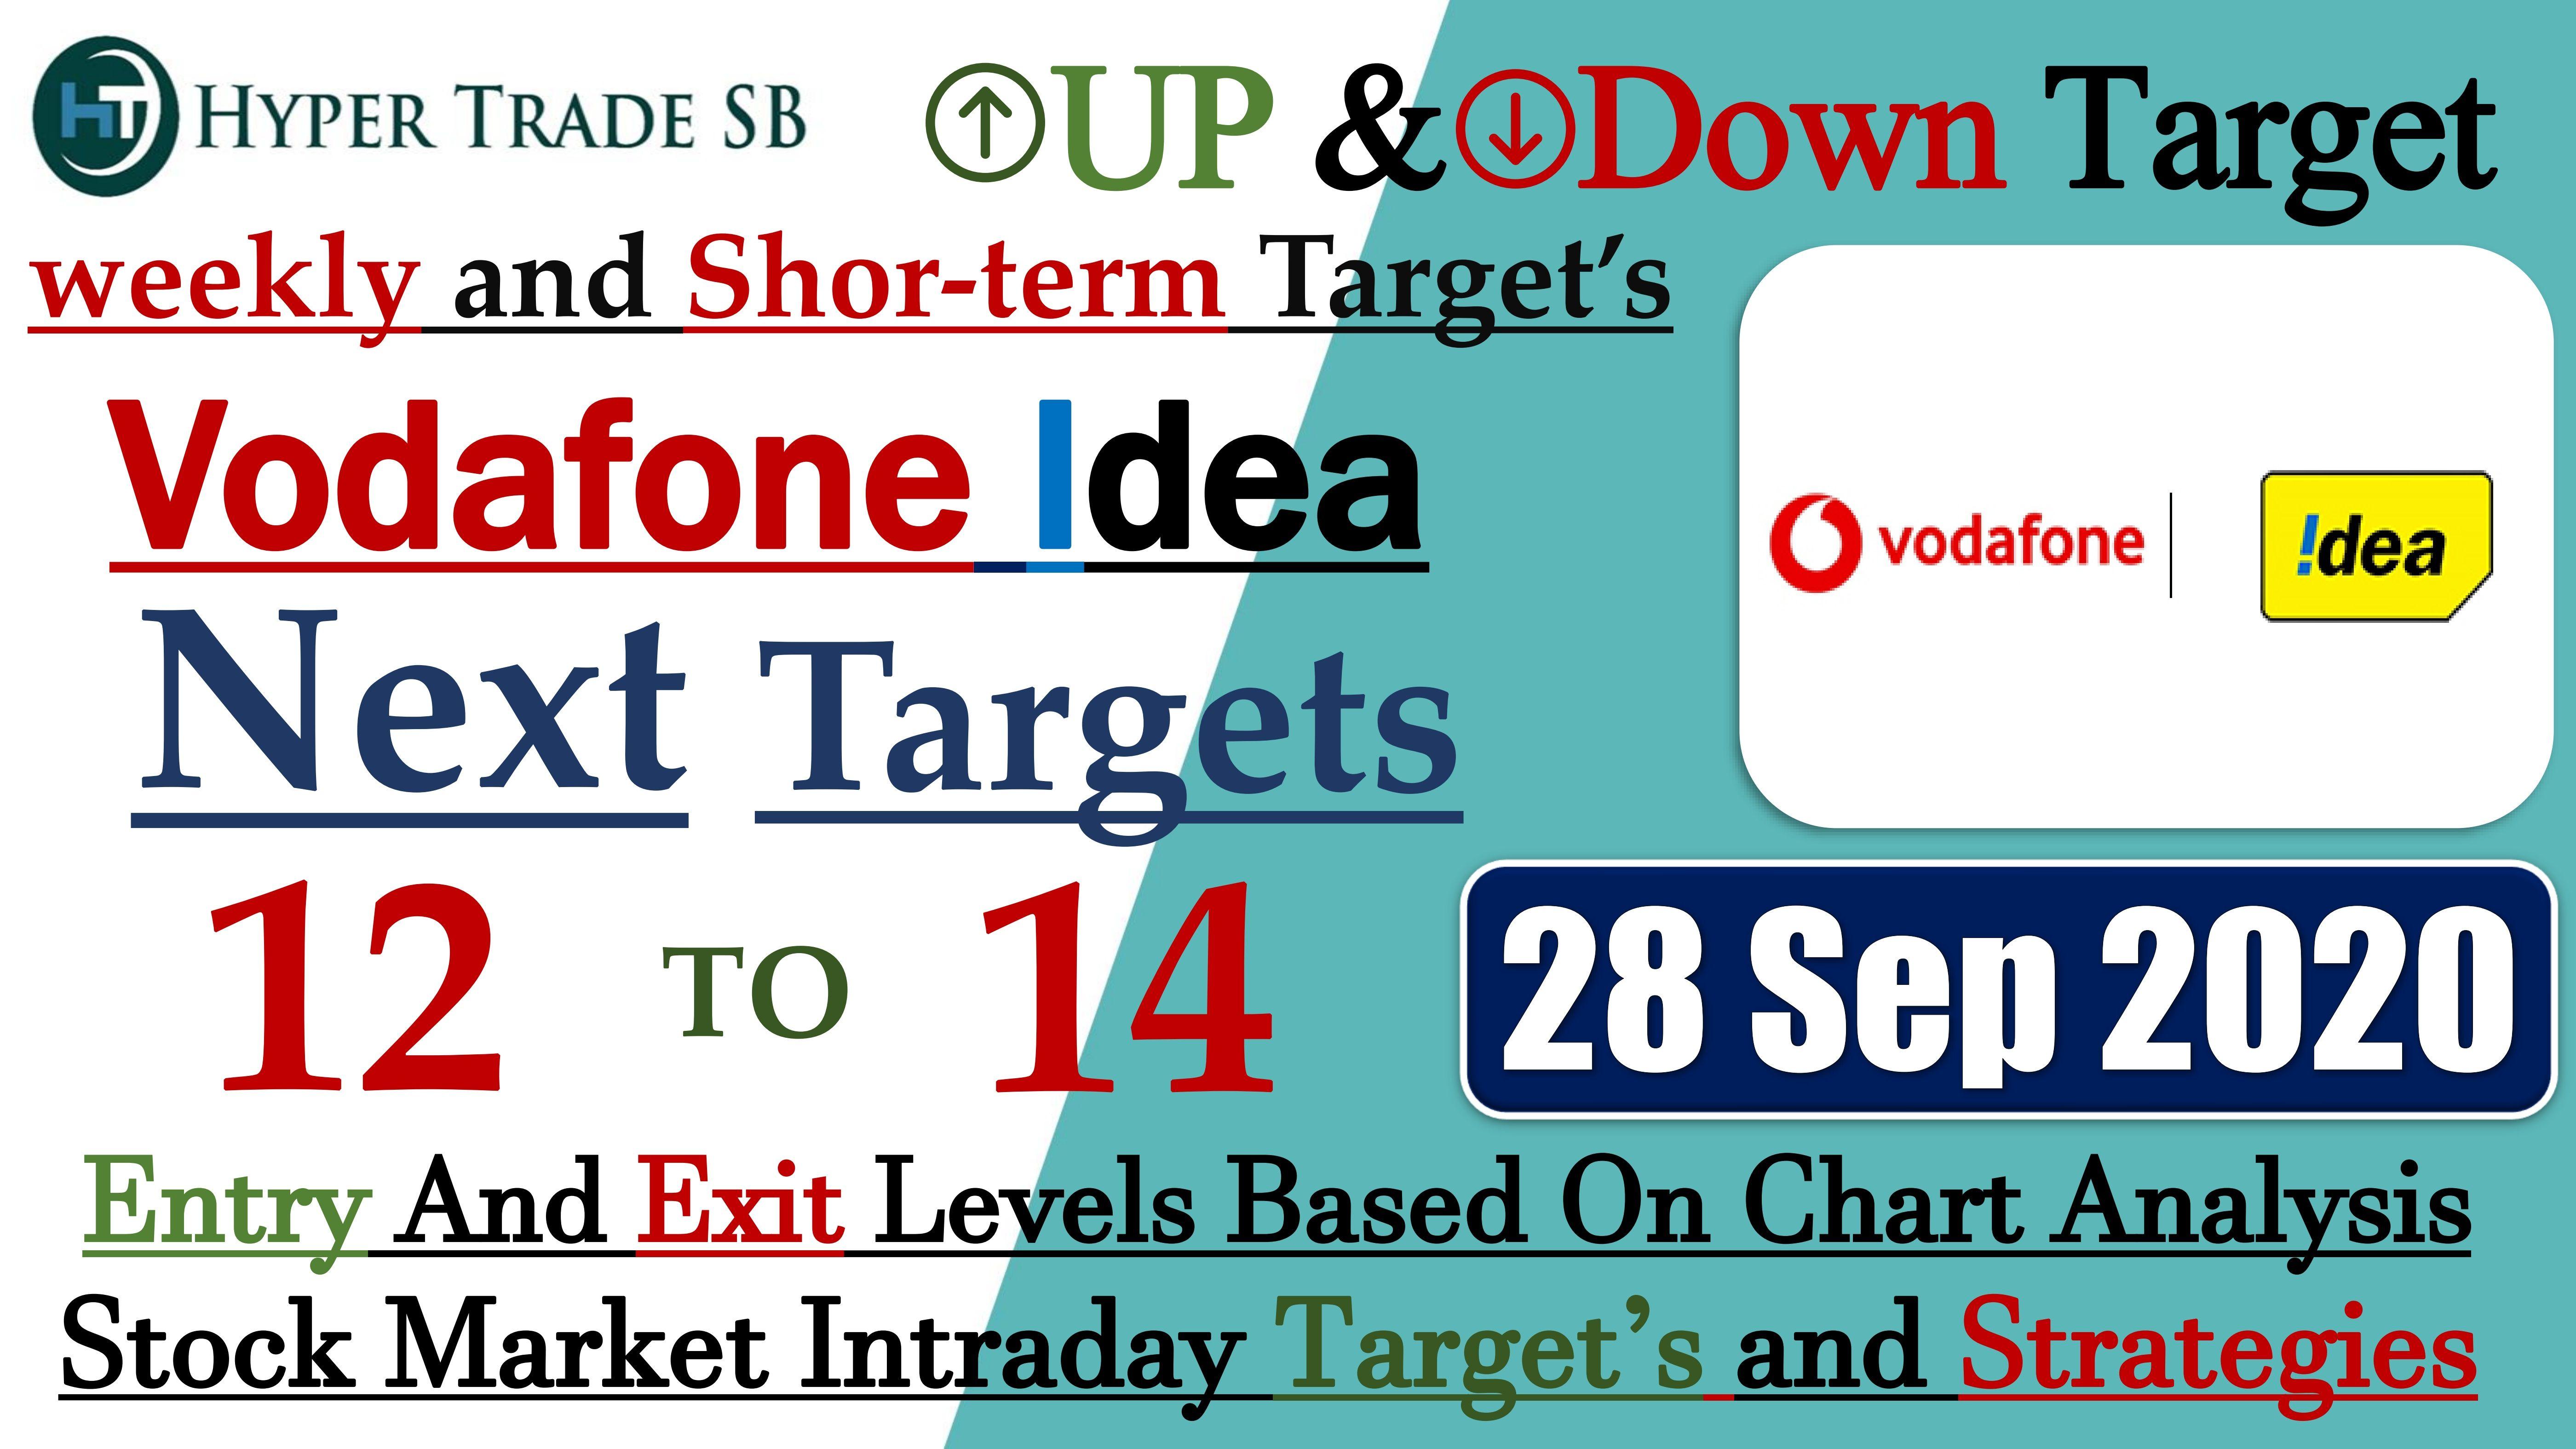 Vodafone Idea Share Price 28 Sept Idea Intraday Tips Idea Share News Intraday Targets Idea Stock Analysis Stock News Education